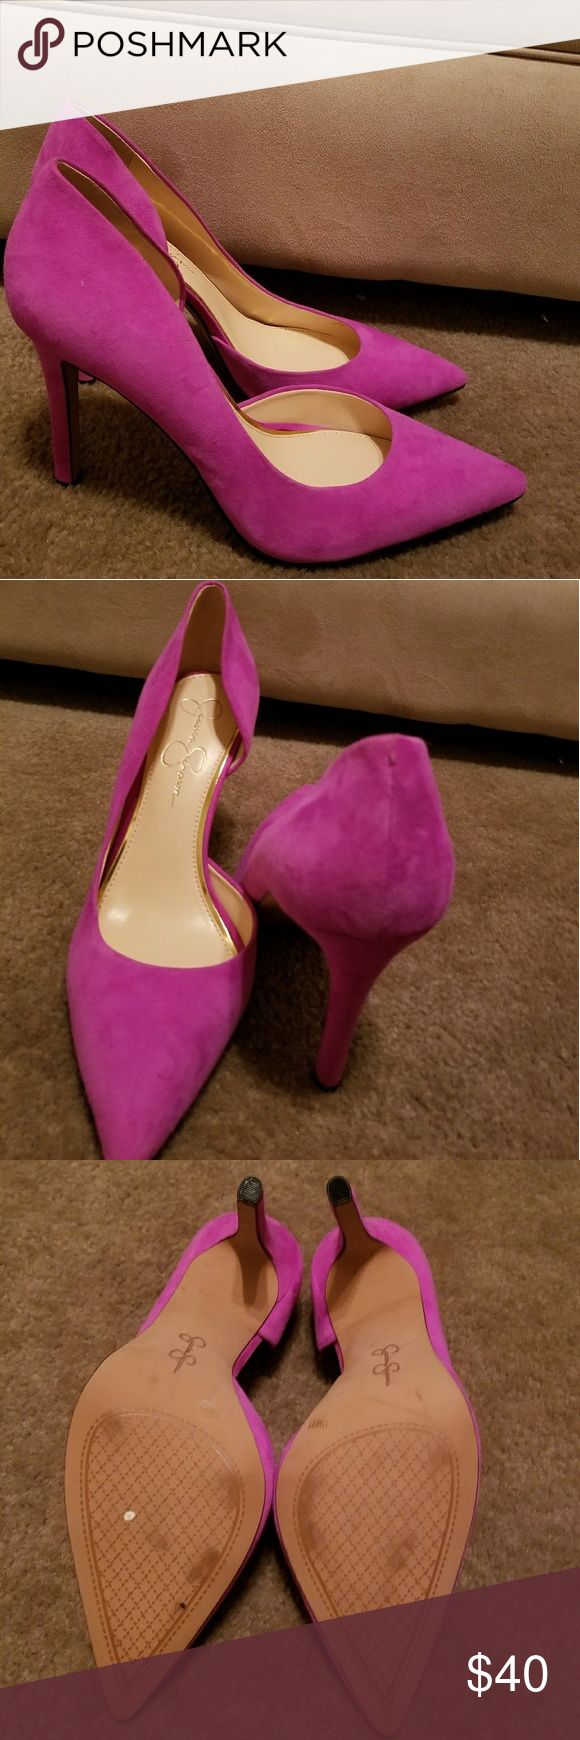 Purple Jessica Simpson pumps Suade pointy toe 4 inch pumps. Jessica Simpson Shoes Heels